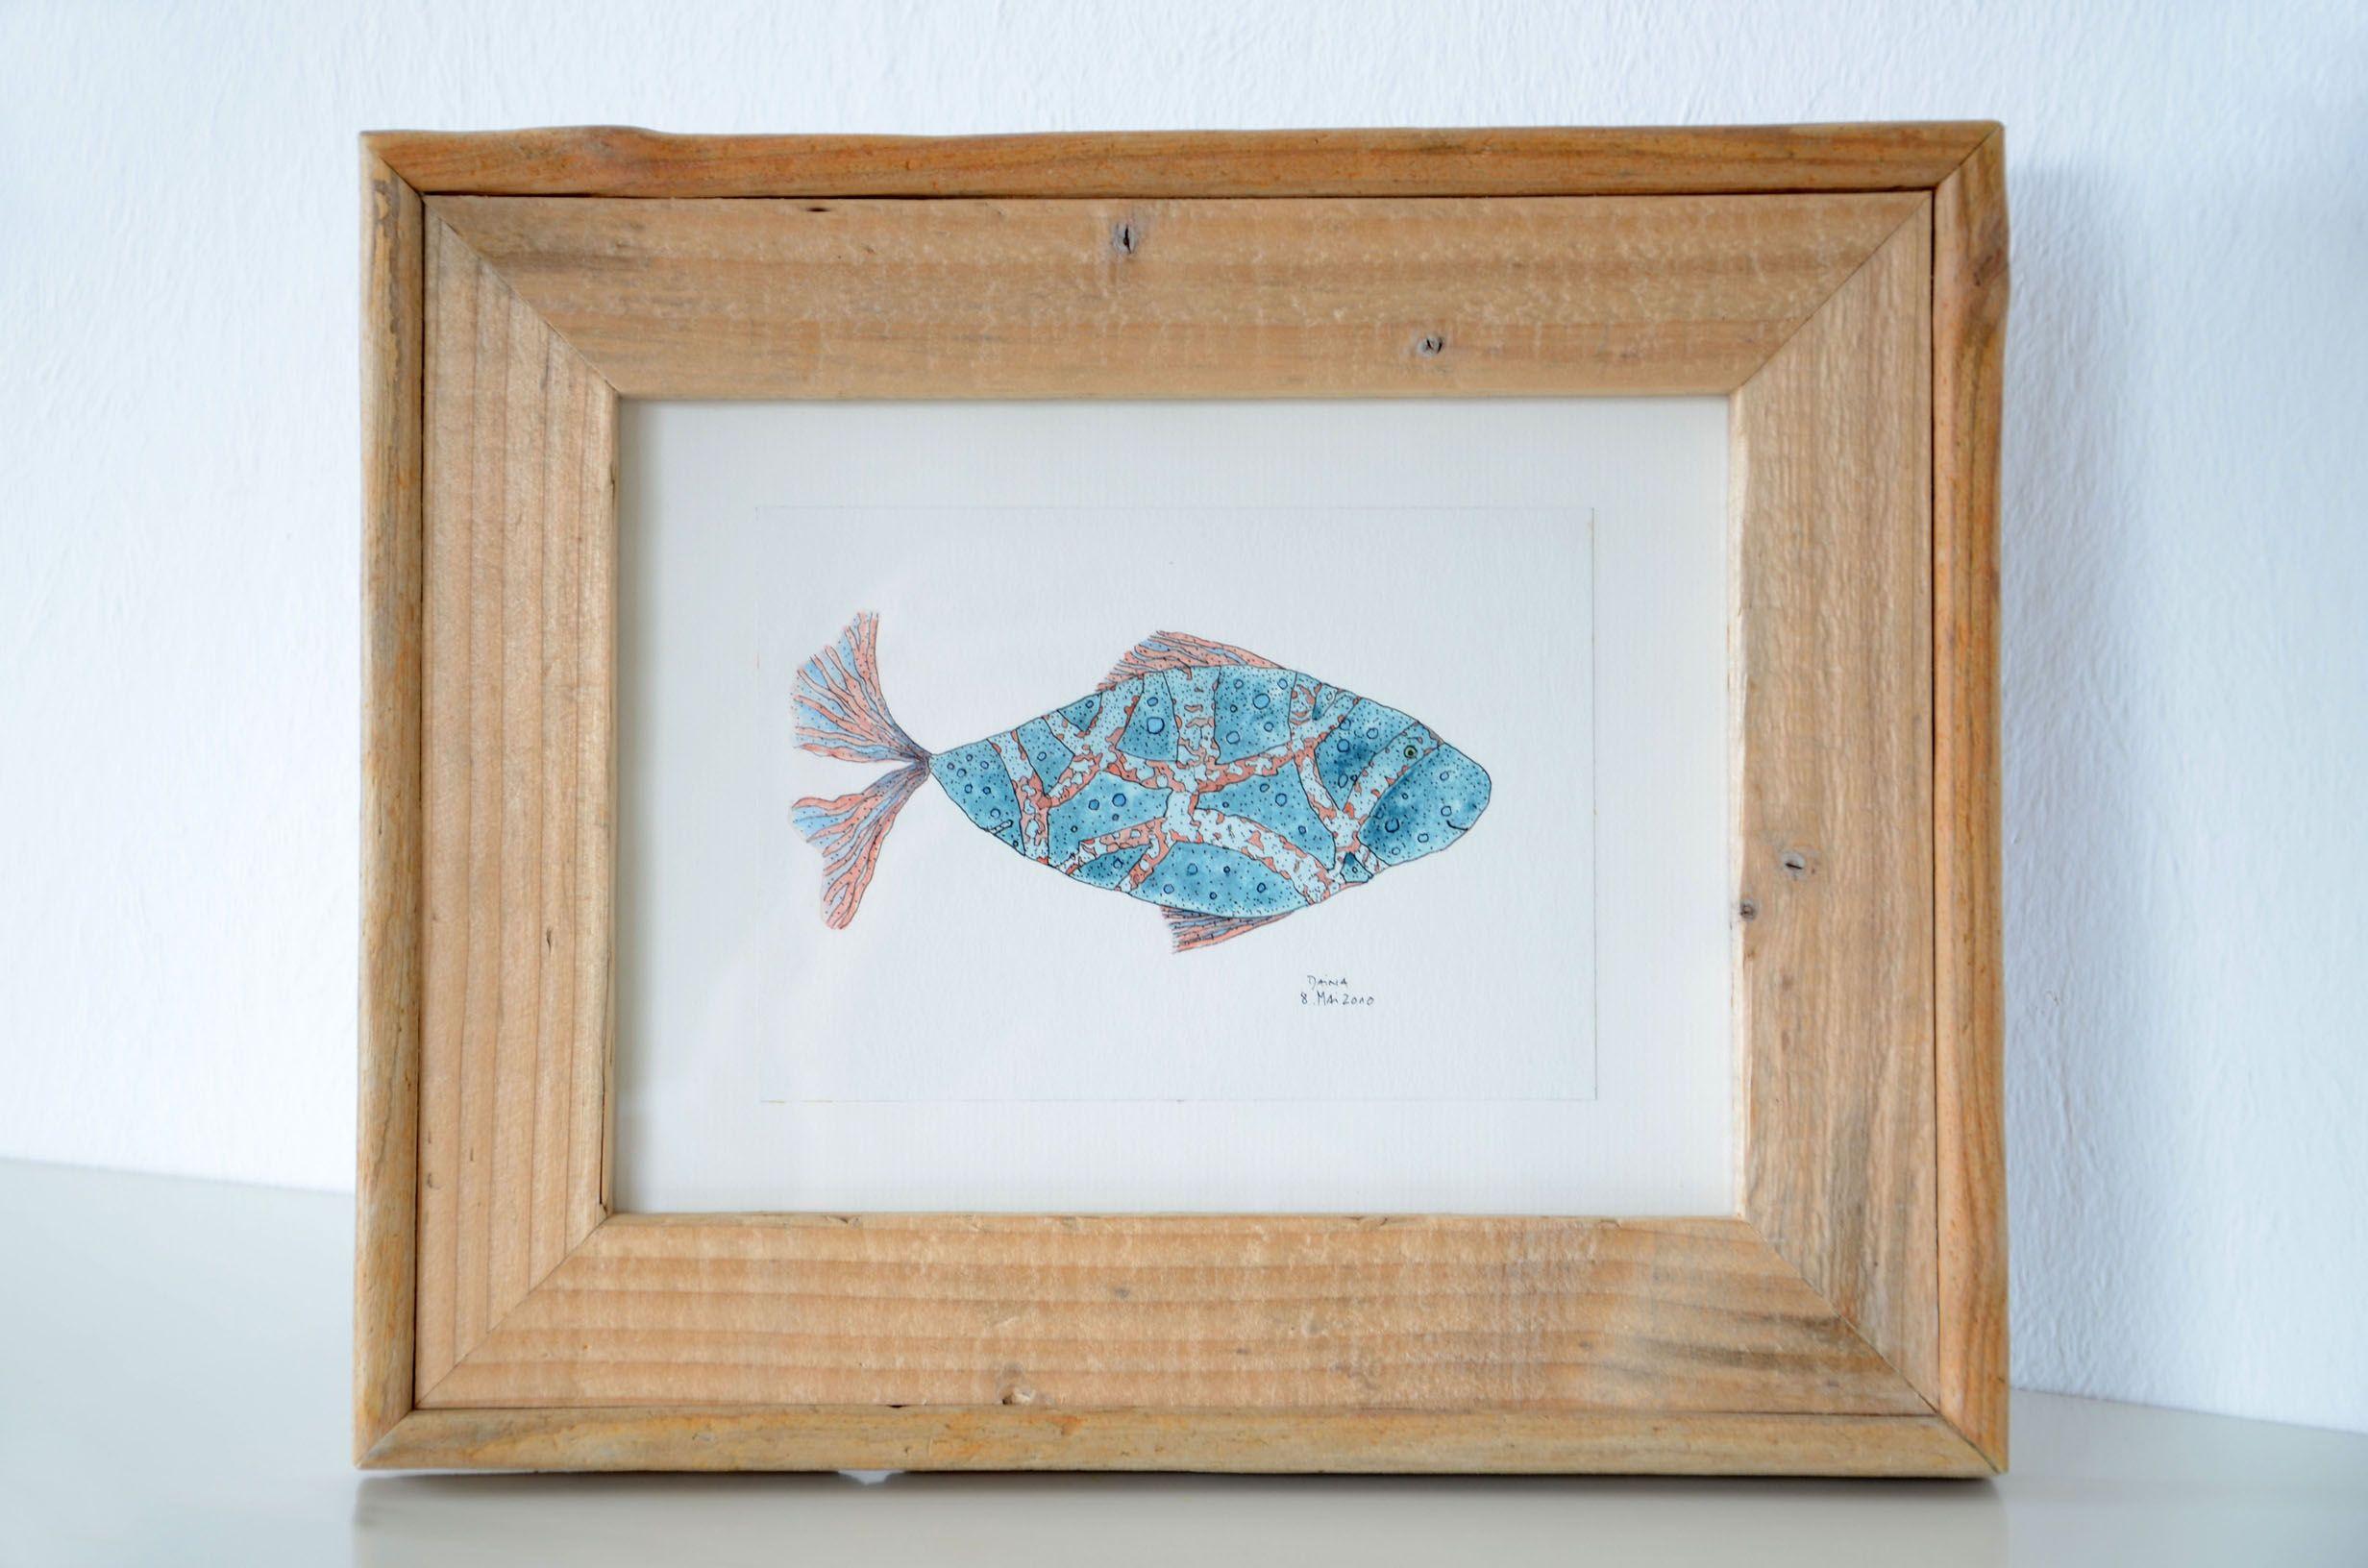 Treibholz-Bilderrahmen DUALITY ~ driftwood picture frame Das Bild im ...